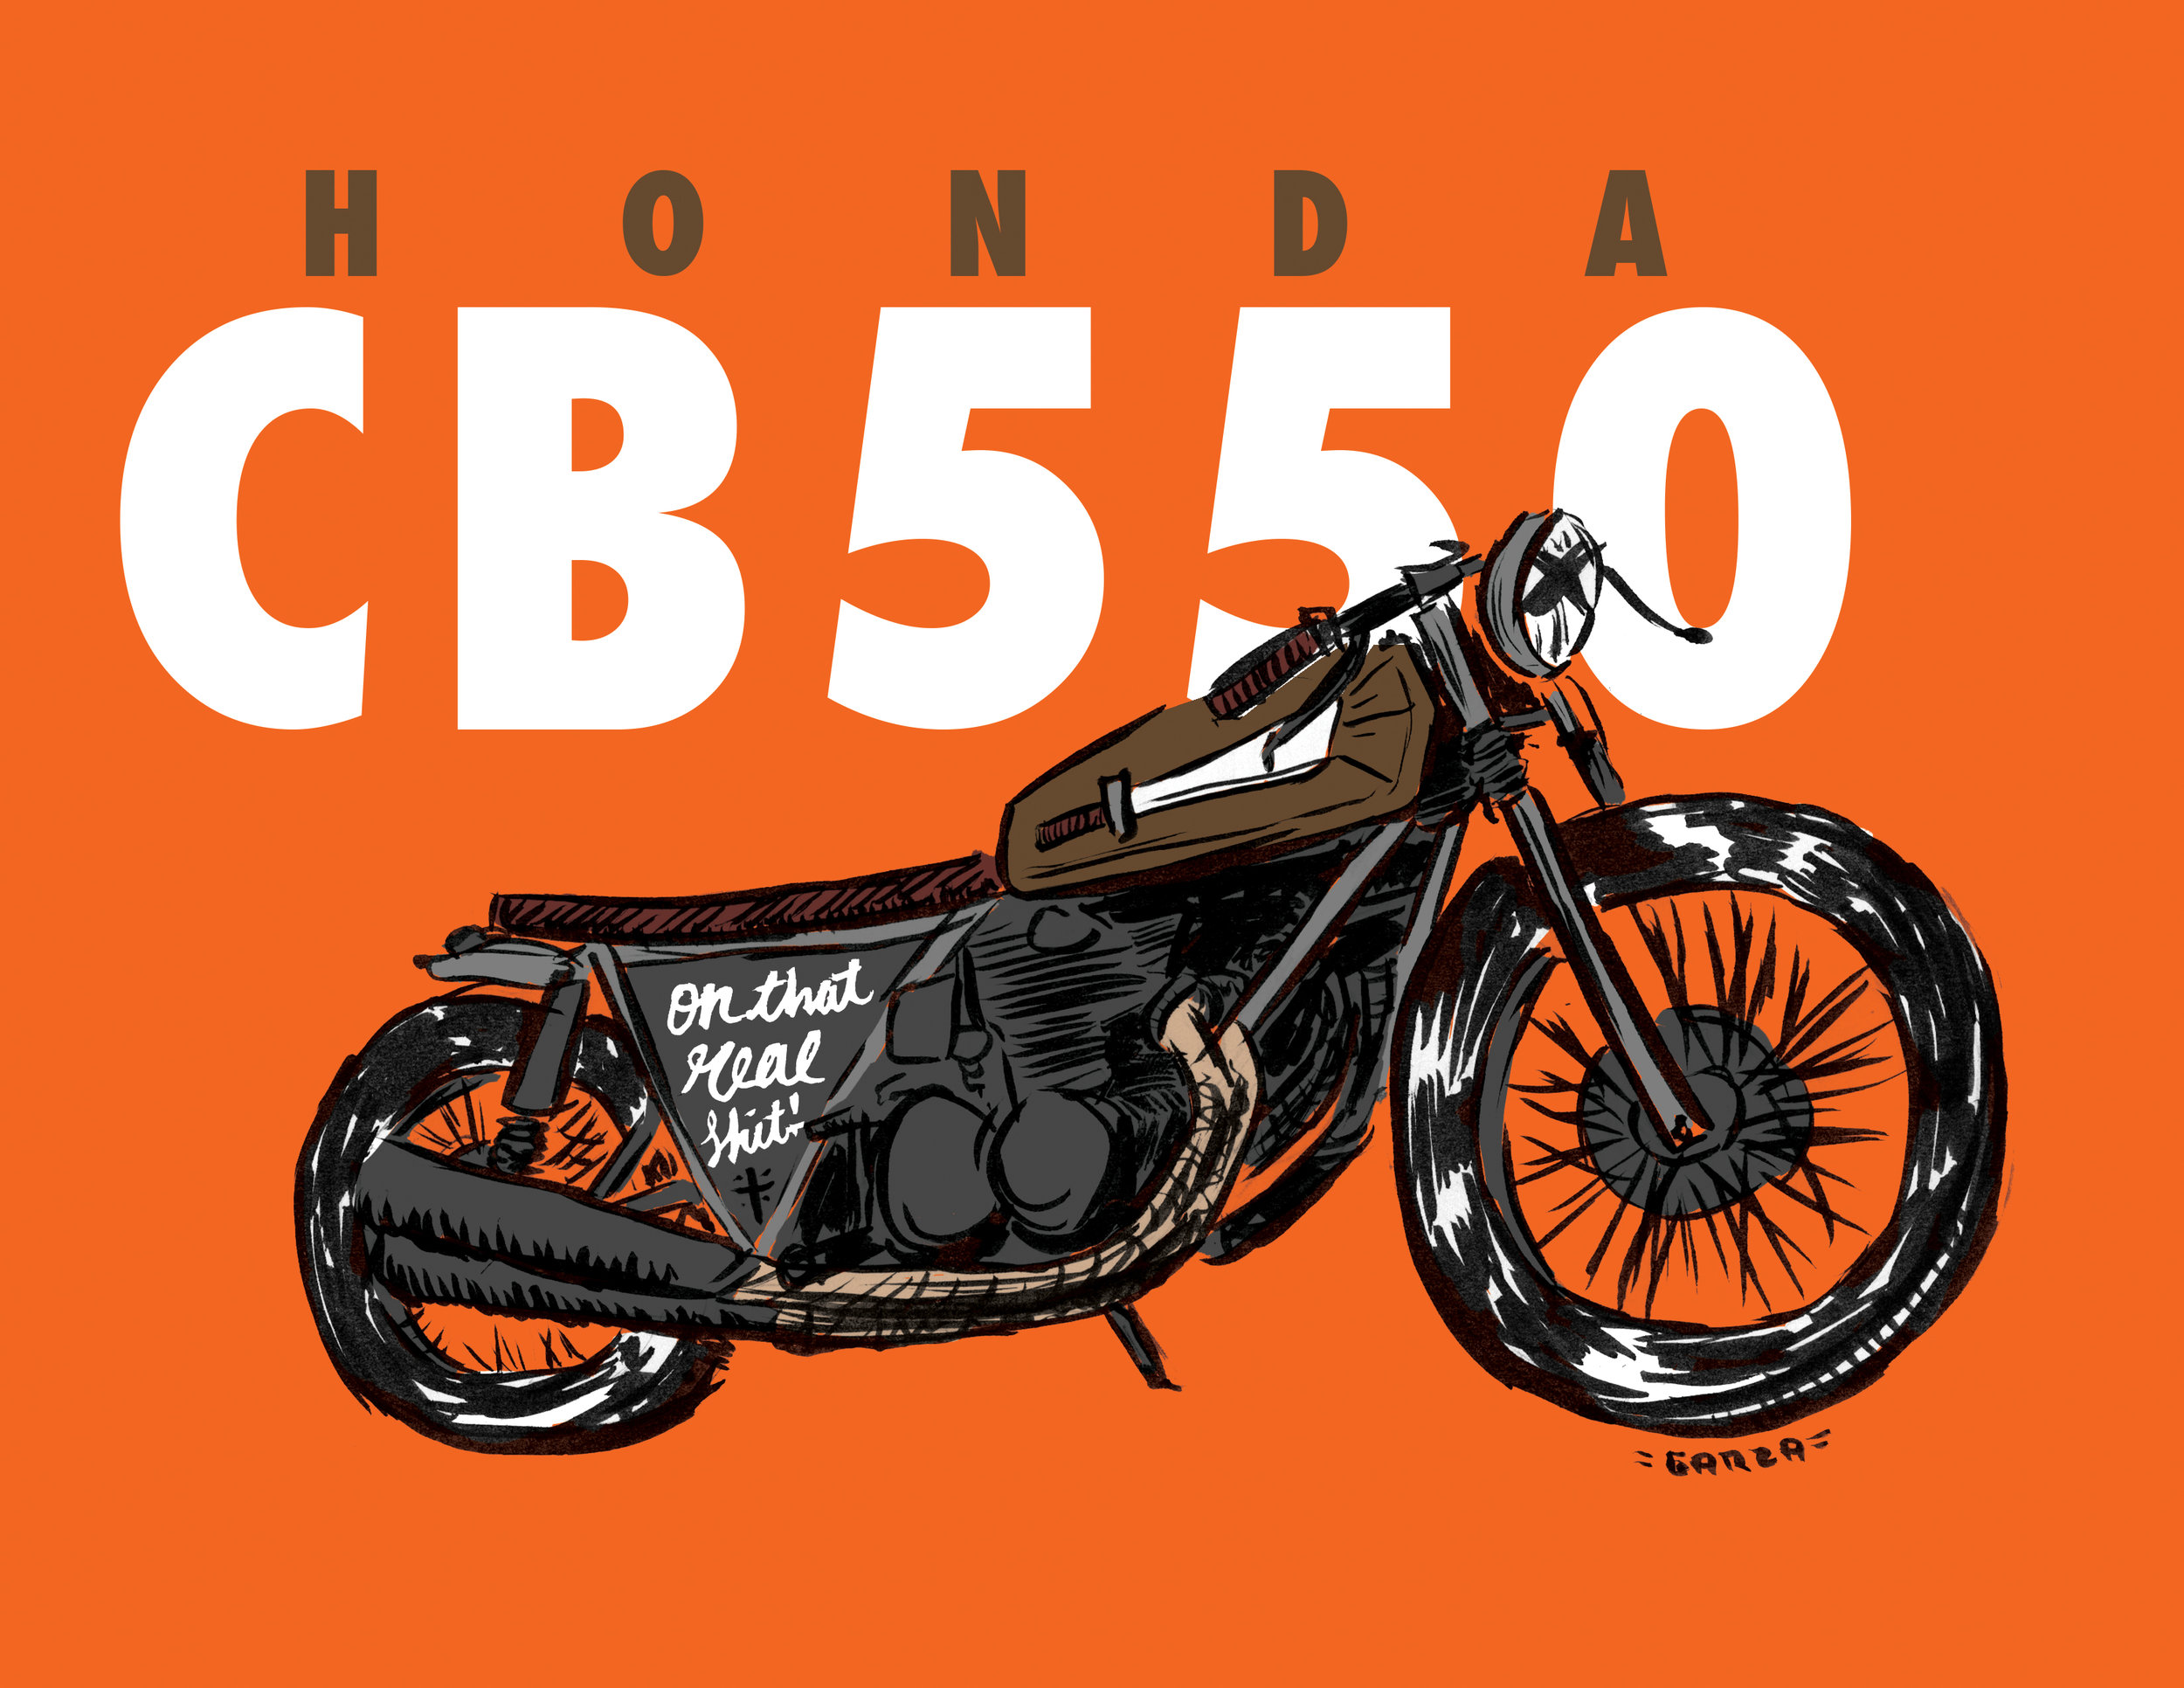 cb550_jongarza.jpg